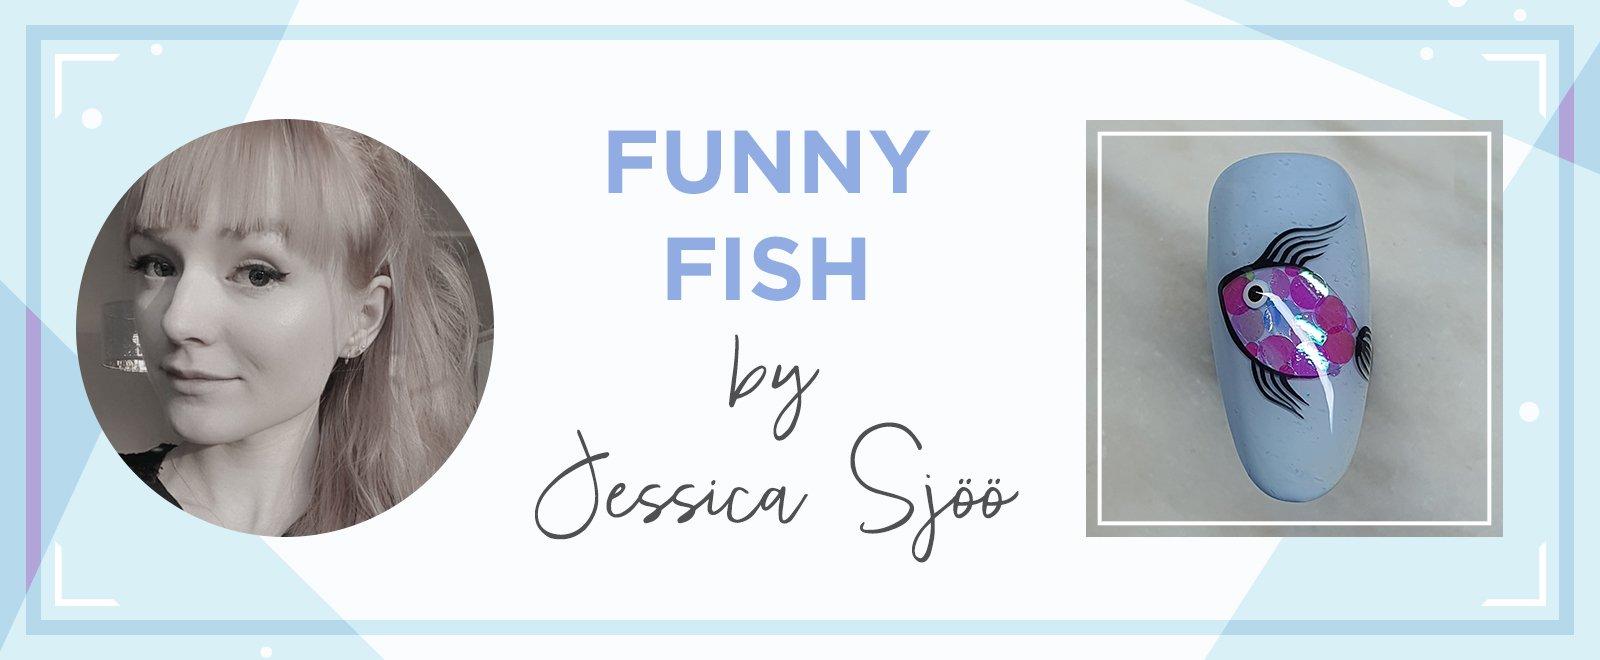 SBS_header_template_1600x660_funny-fish_Jessica-Sjöö